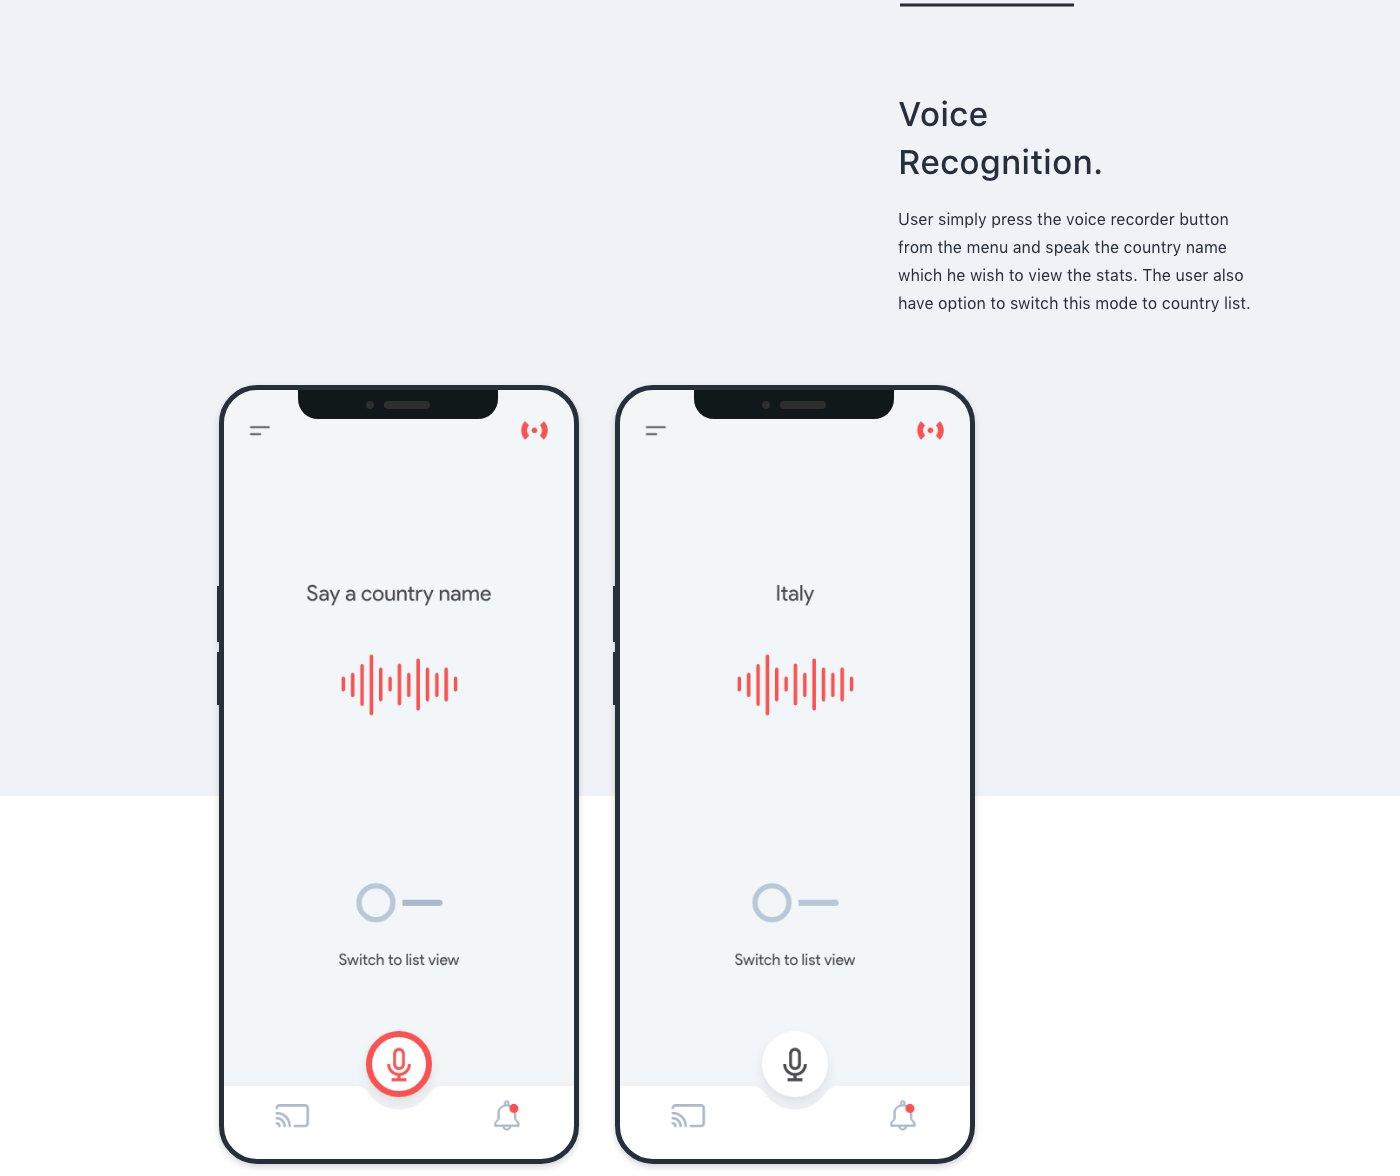 coronavirus ui kit - voice recognition